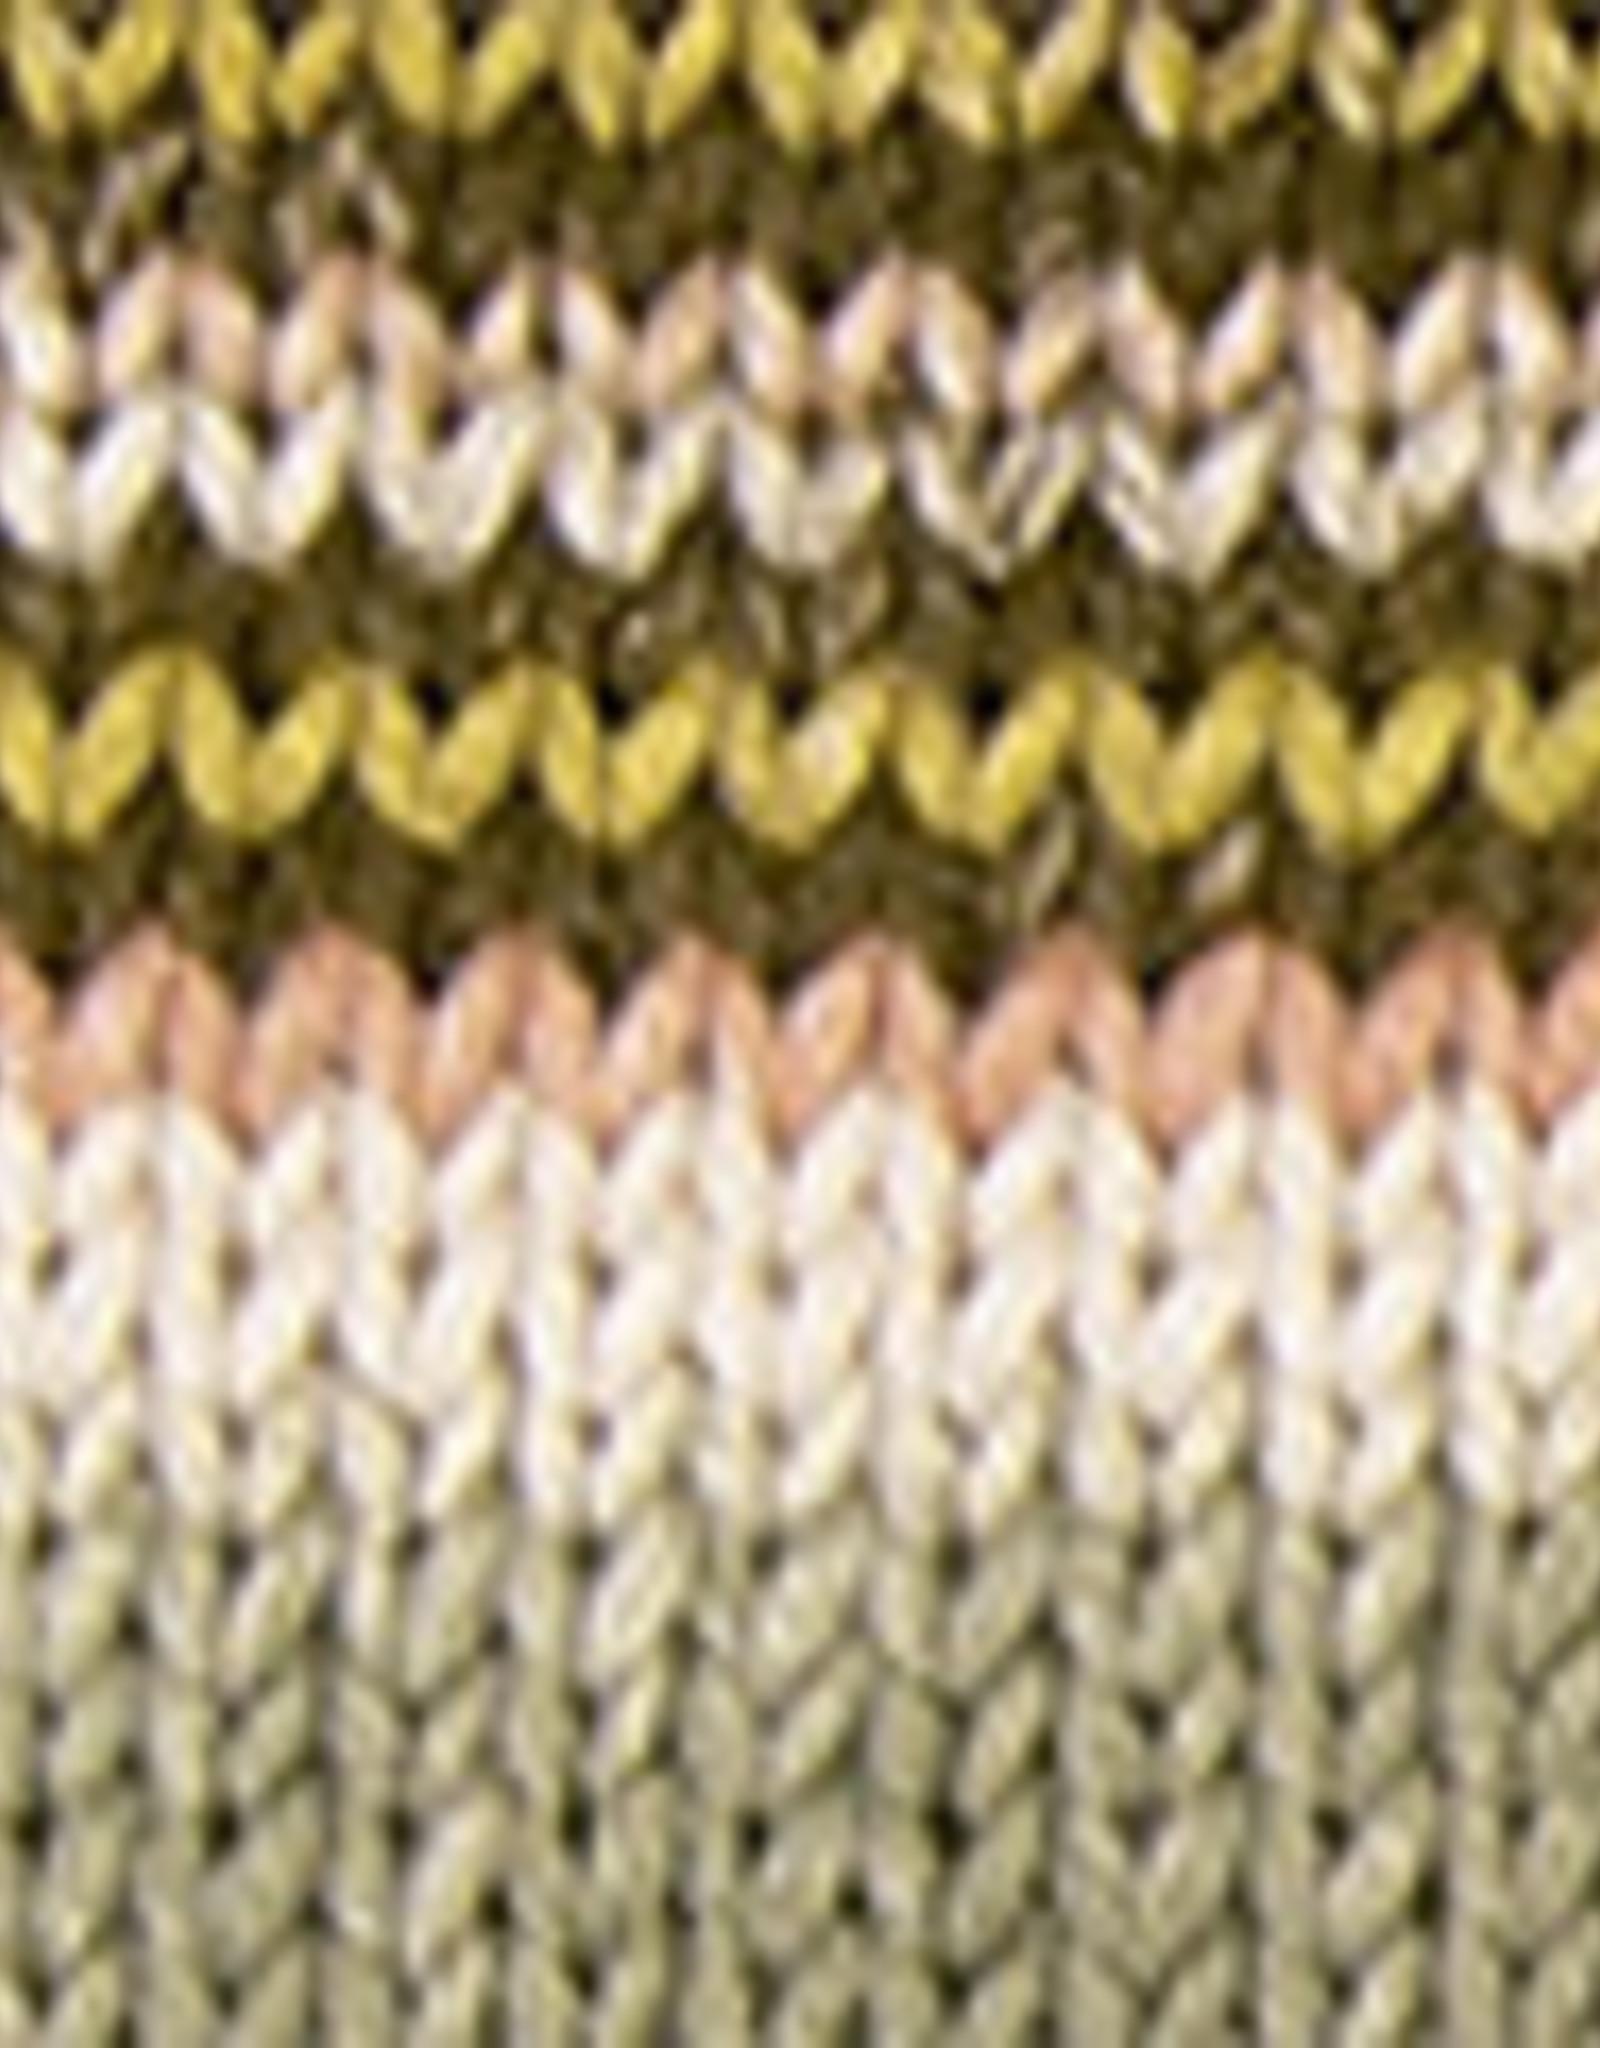 Katia Katia Cotton Cashmere degrade 104 - Parelmoer-lichtviolet-Pistache-Bleekrood-Geel